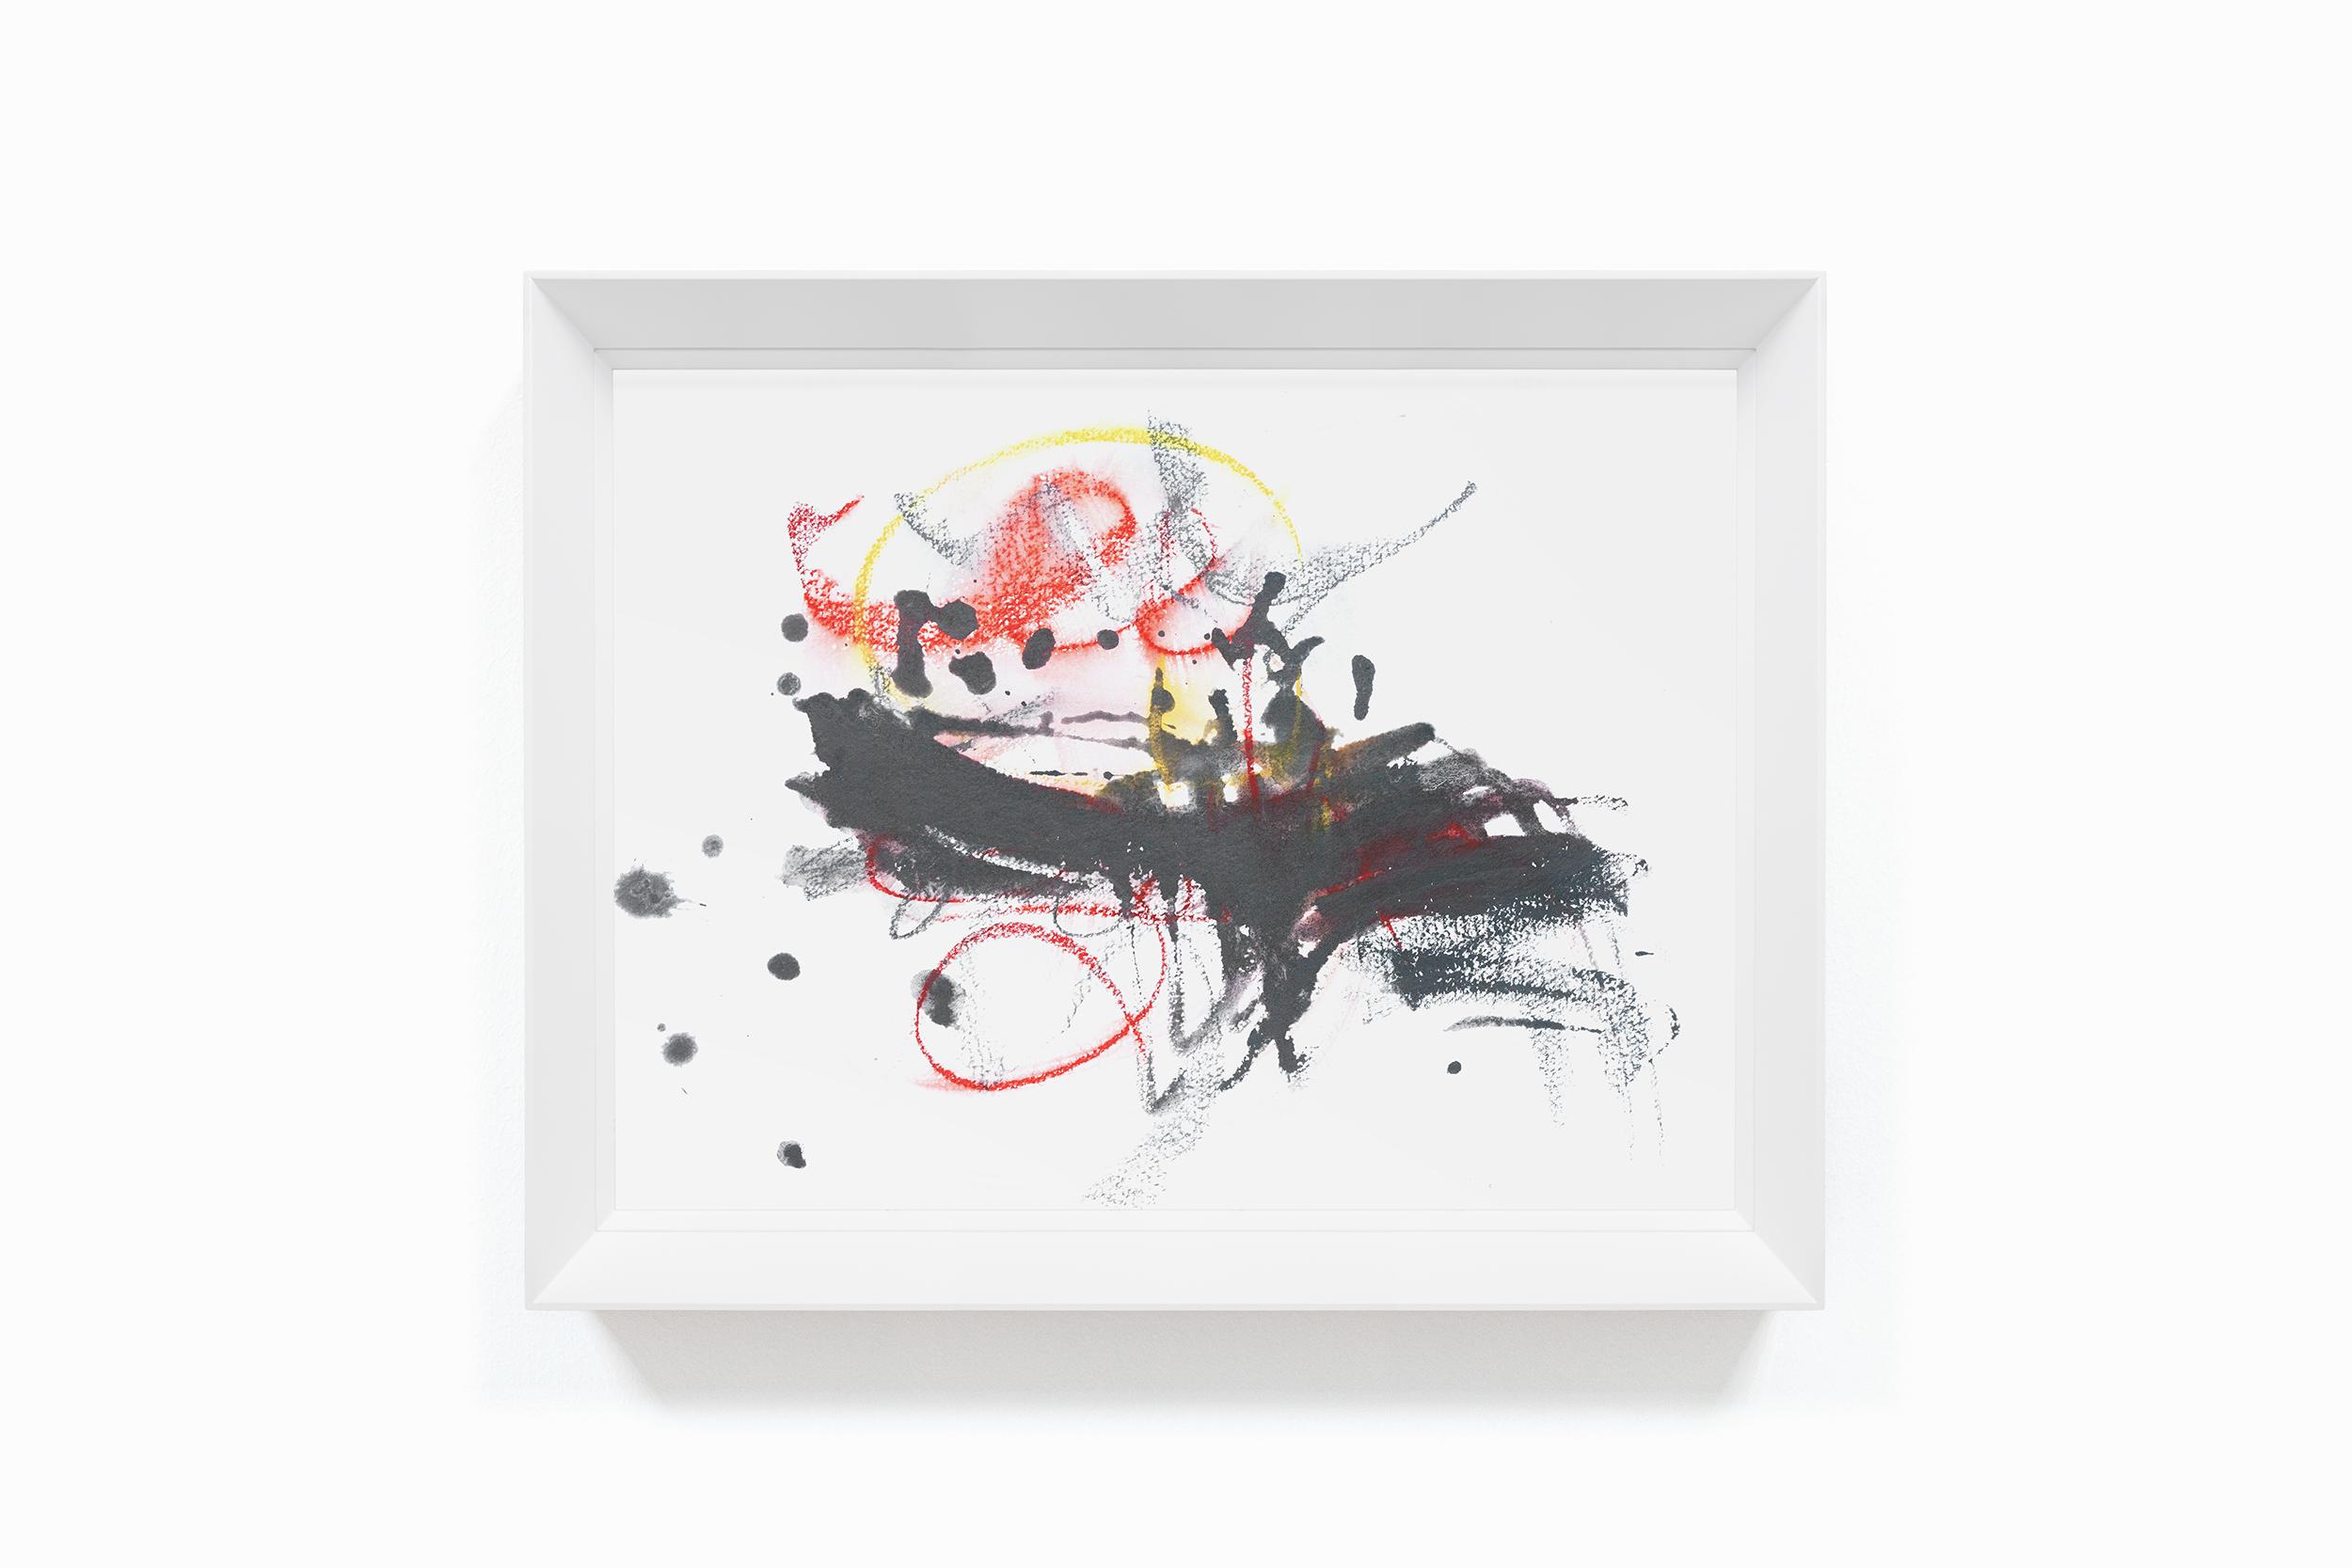 059B Andre Gigante Pintura Painting bonjourmolotov La.jpg